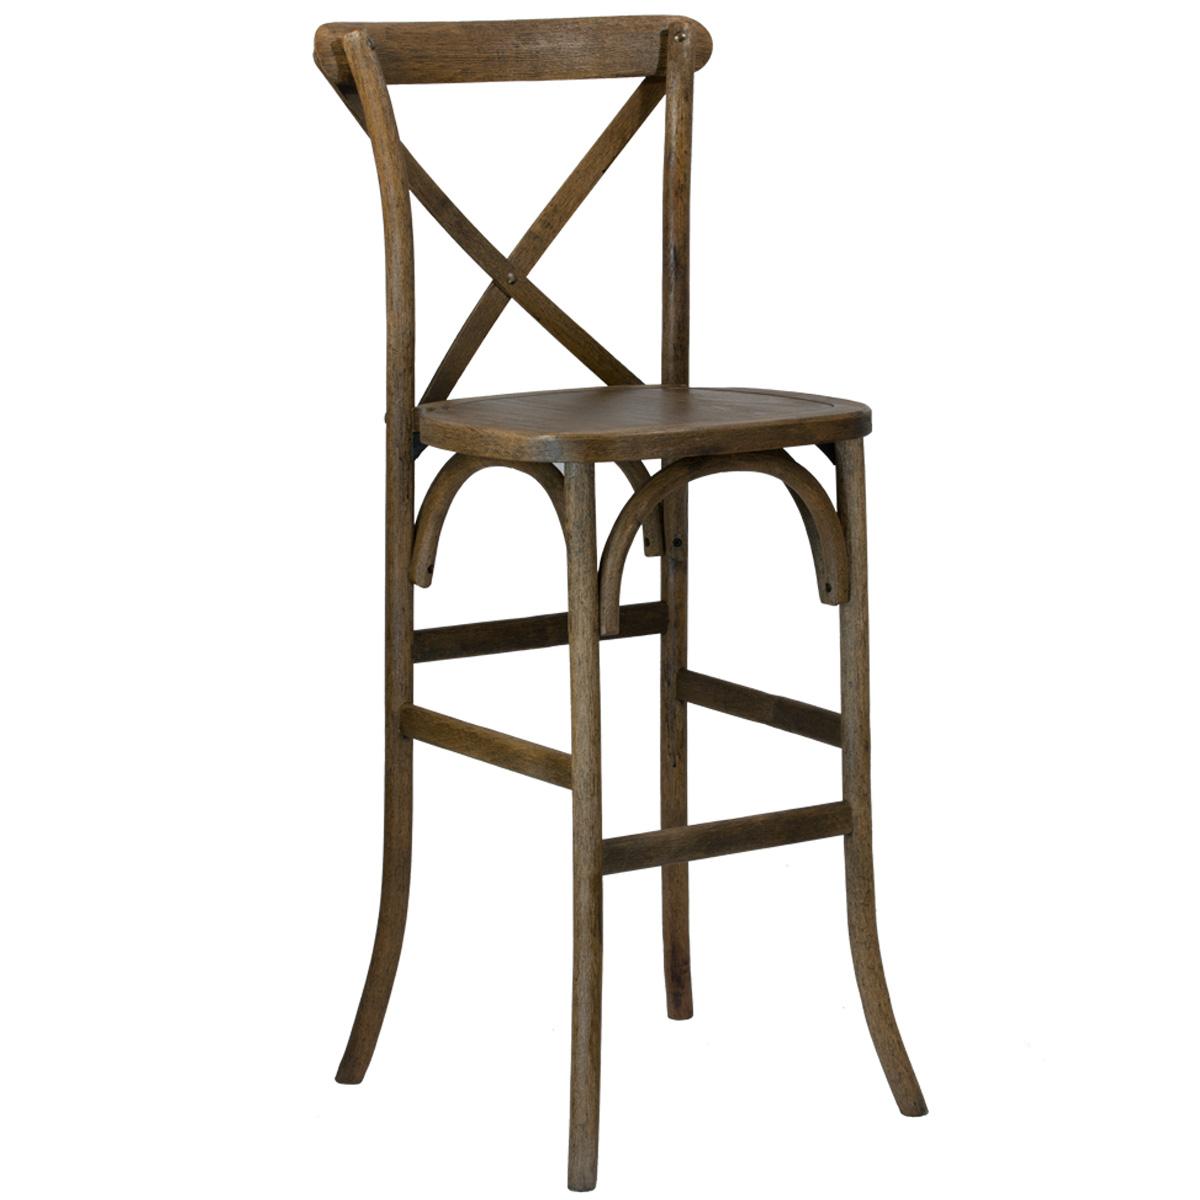 table and chair rentals sacramento polywood modern folding adirondack cross back barstool celebrations party